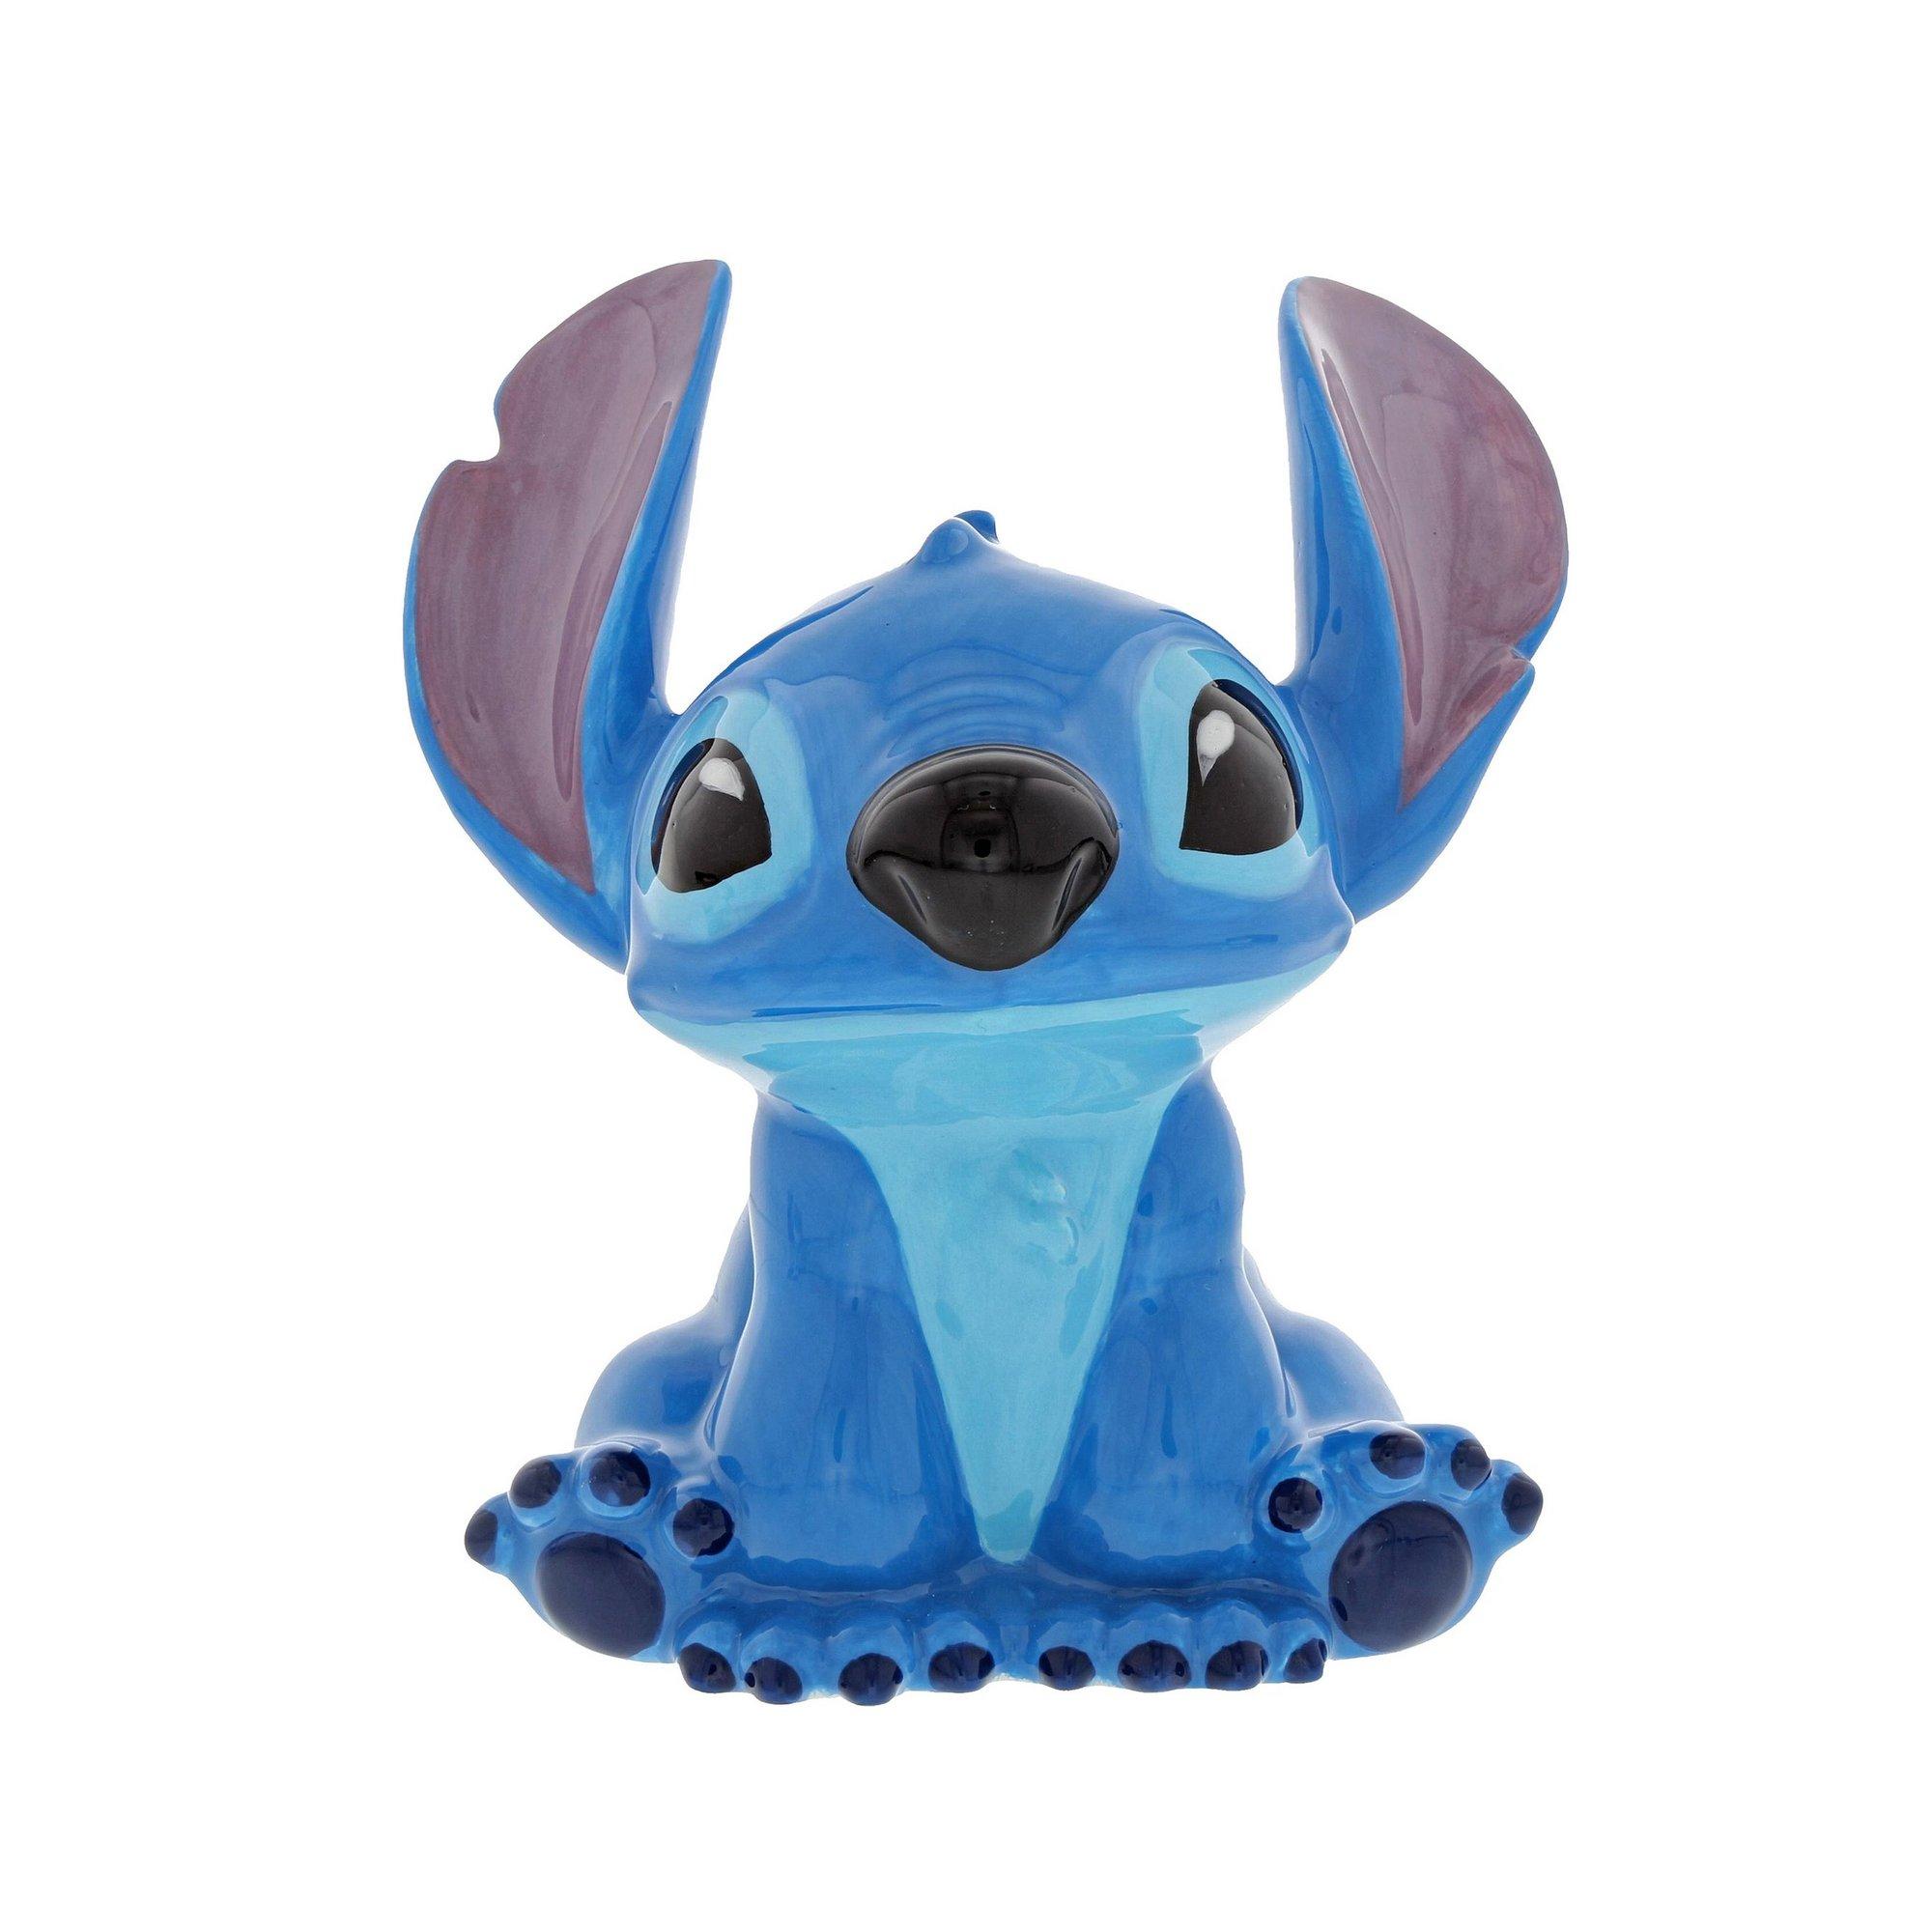 Image of Enchanting Disney Experiment 626 Stitch Money Bank